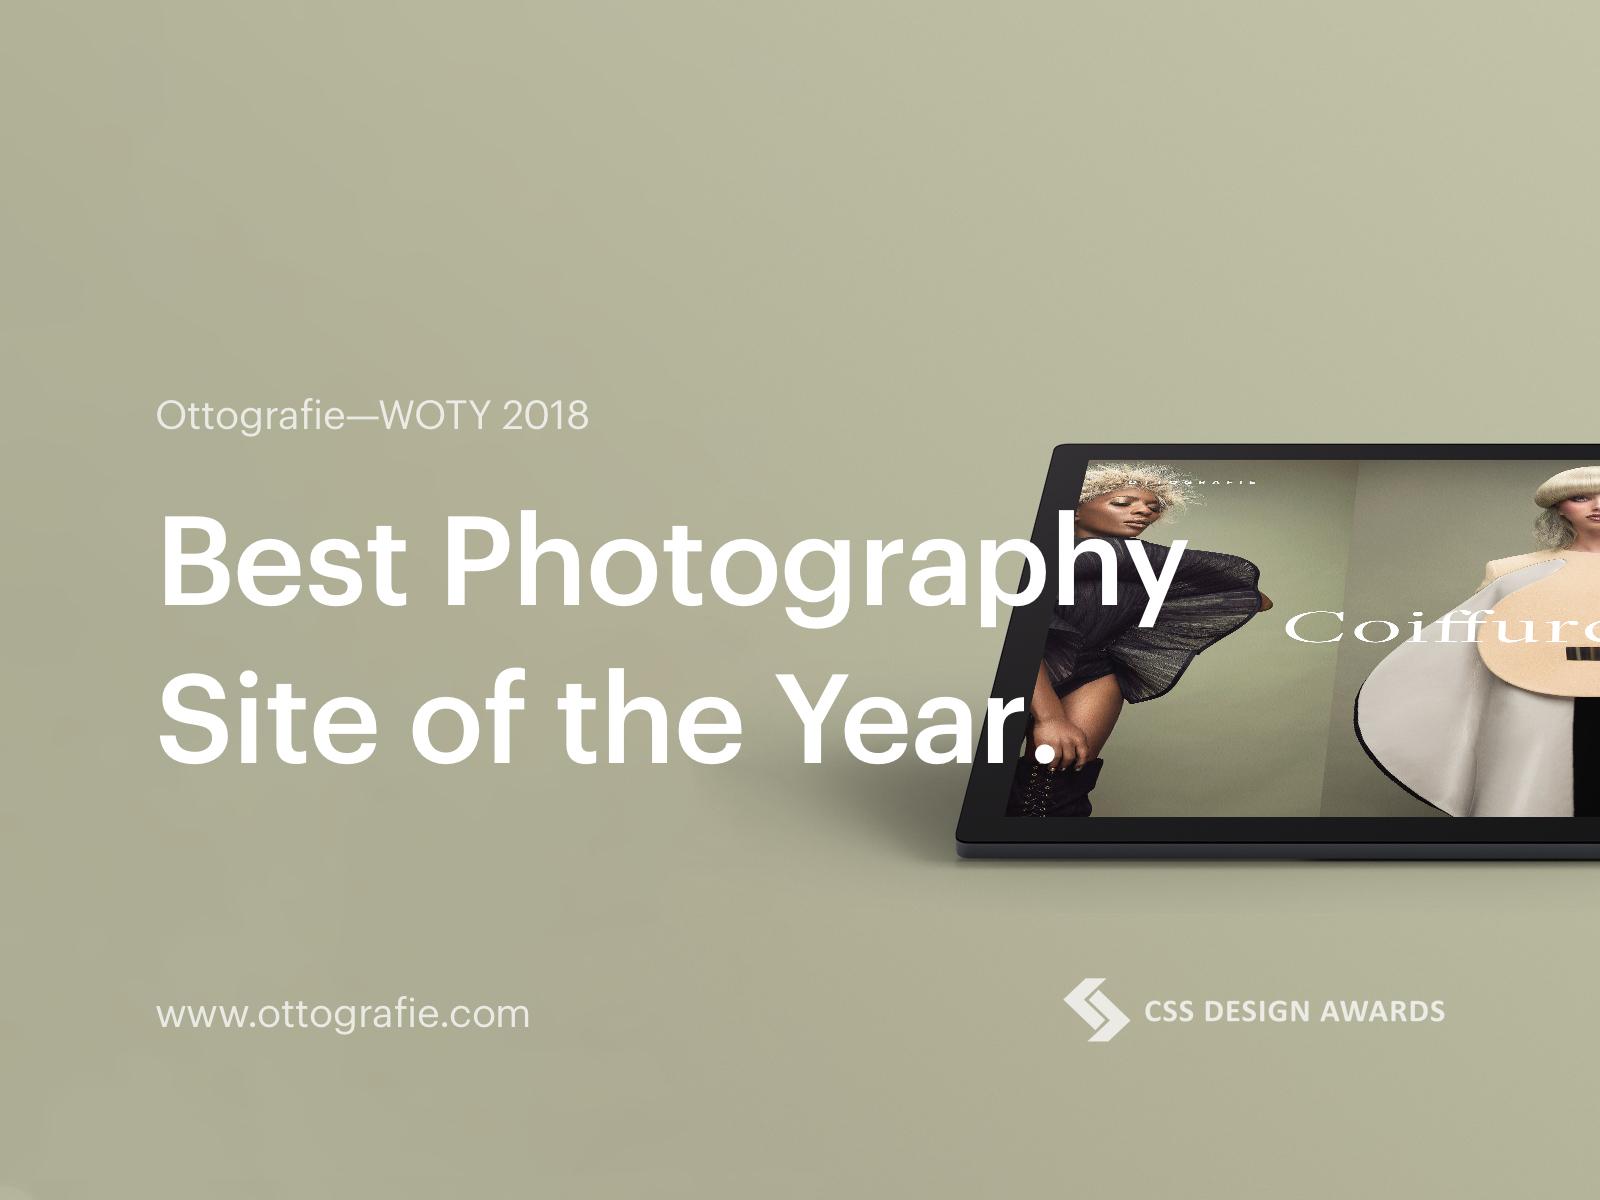 Woty 2018 css design awards ottografie